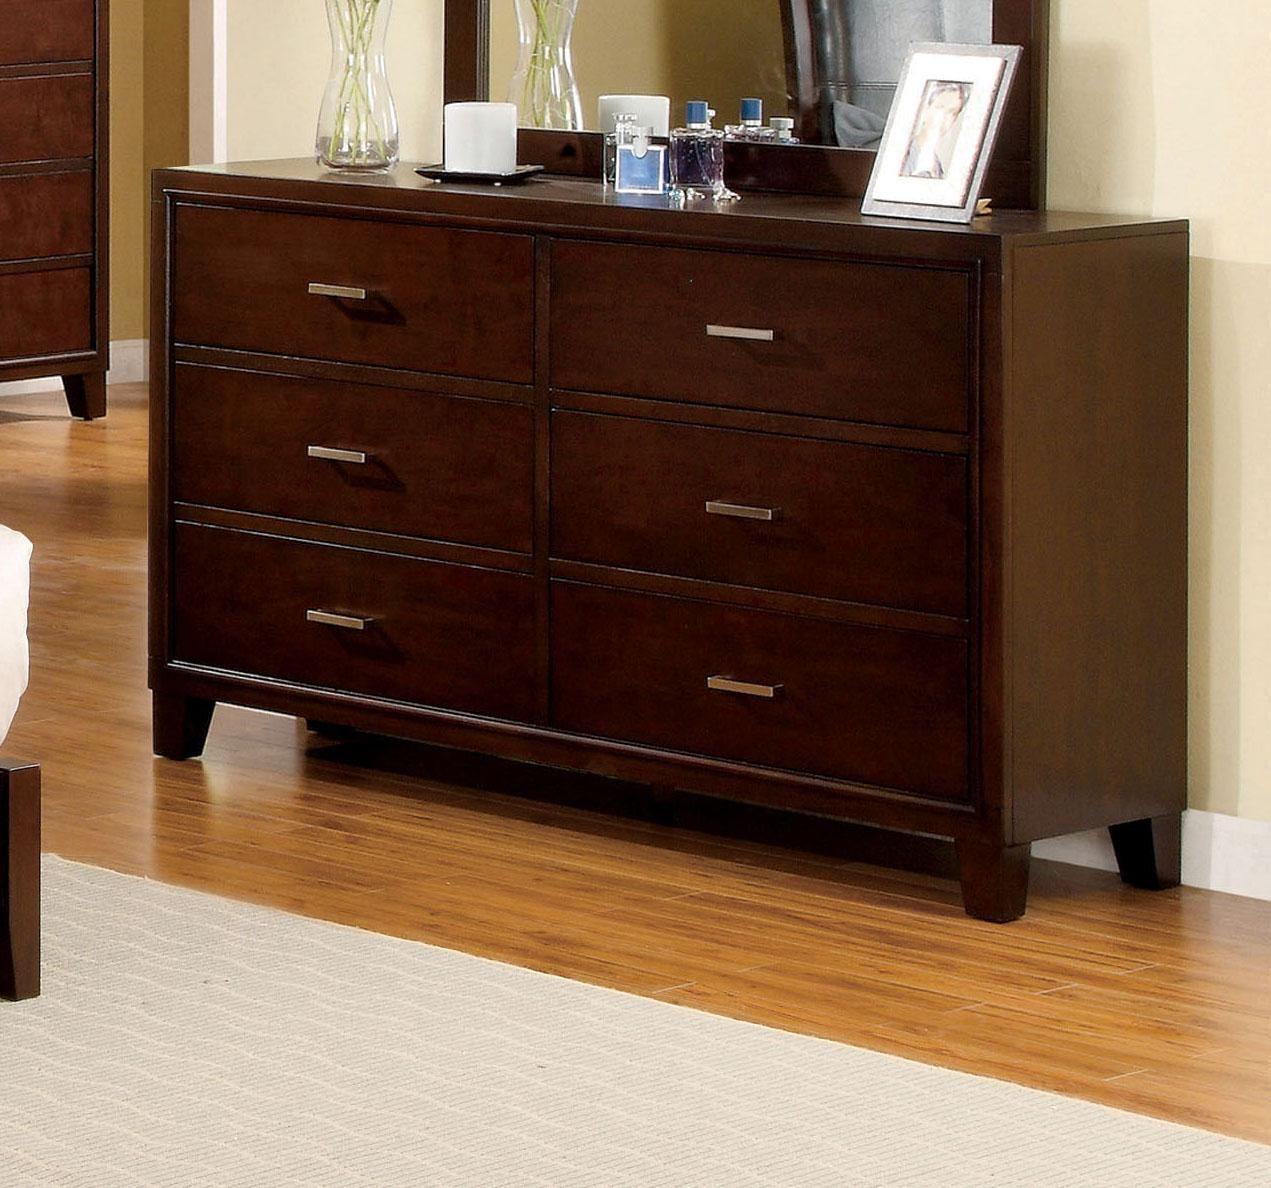 Urbal Furnishings Dorothy Dresser By Oj Commerce Idf 7068d